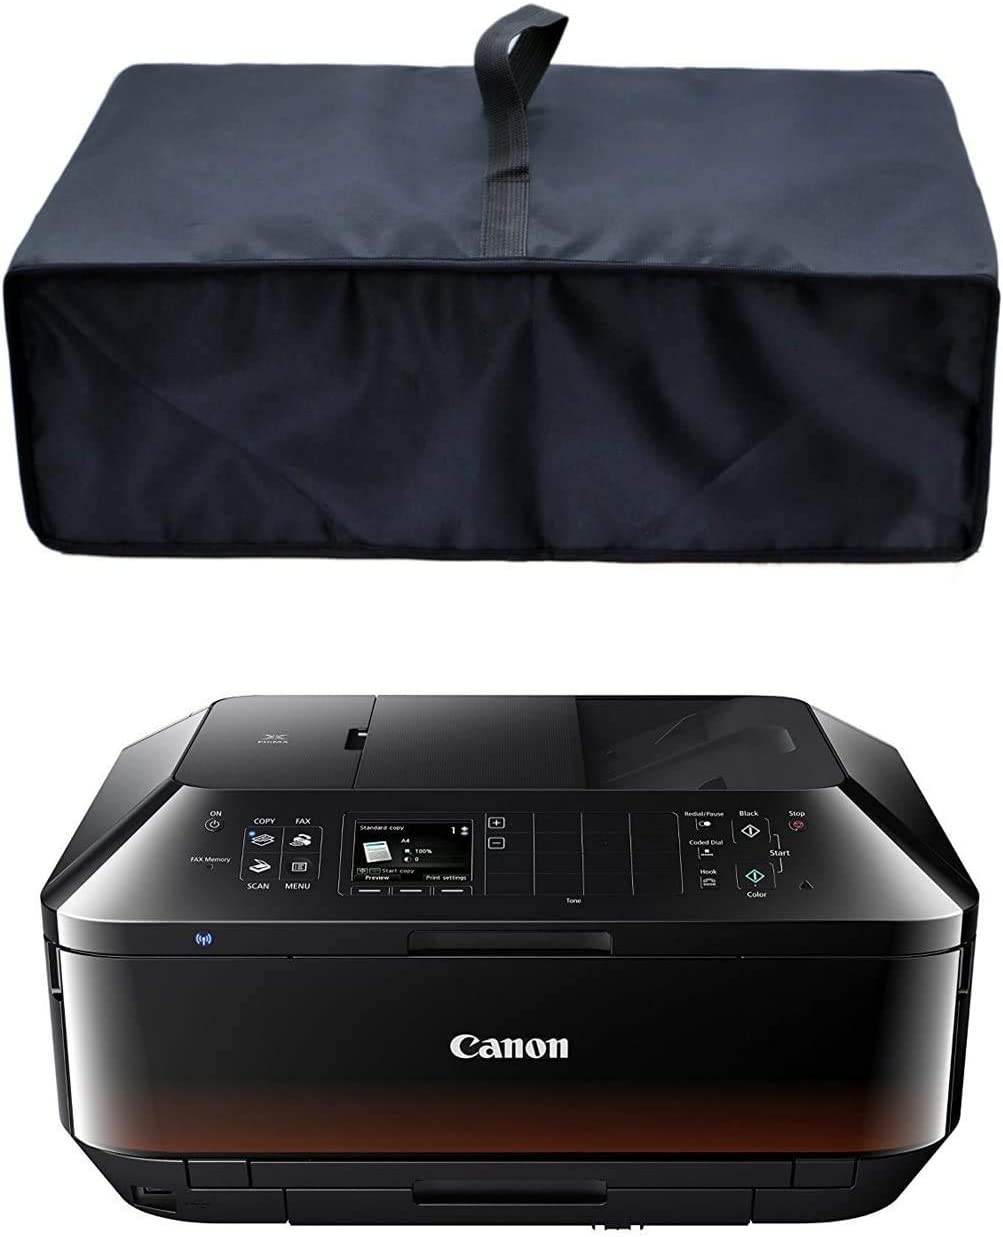 Black Antistatic Water Resistant Heavy Duty Premium Fabric Printer Dust Cover for Canon Pixma MX722 / MX922 / MX925 Printers